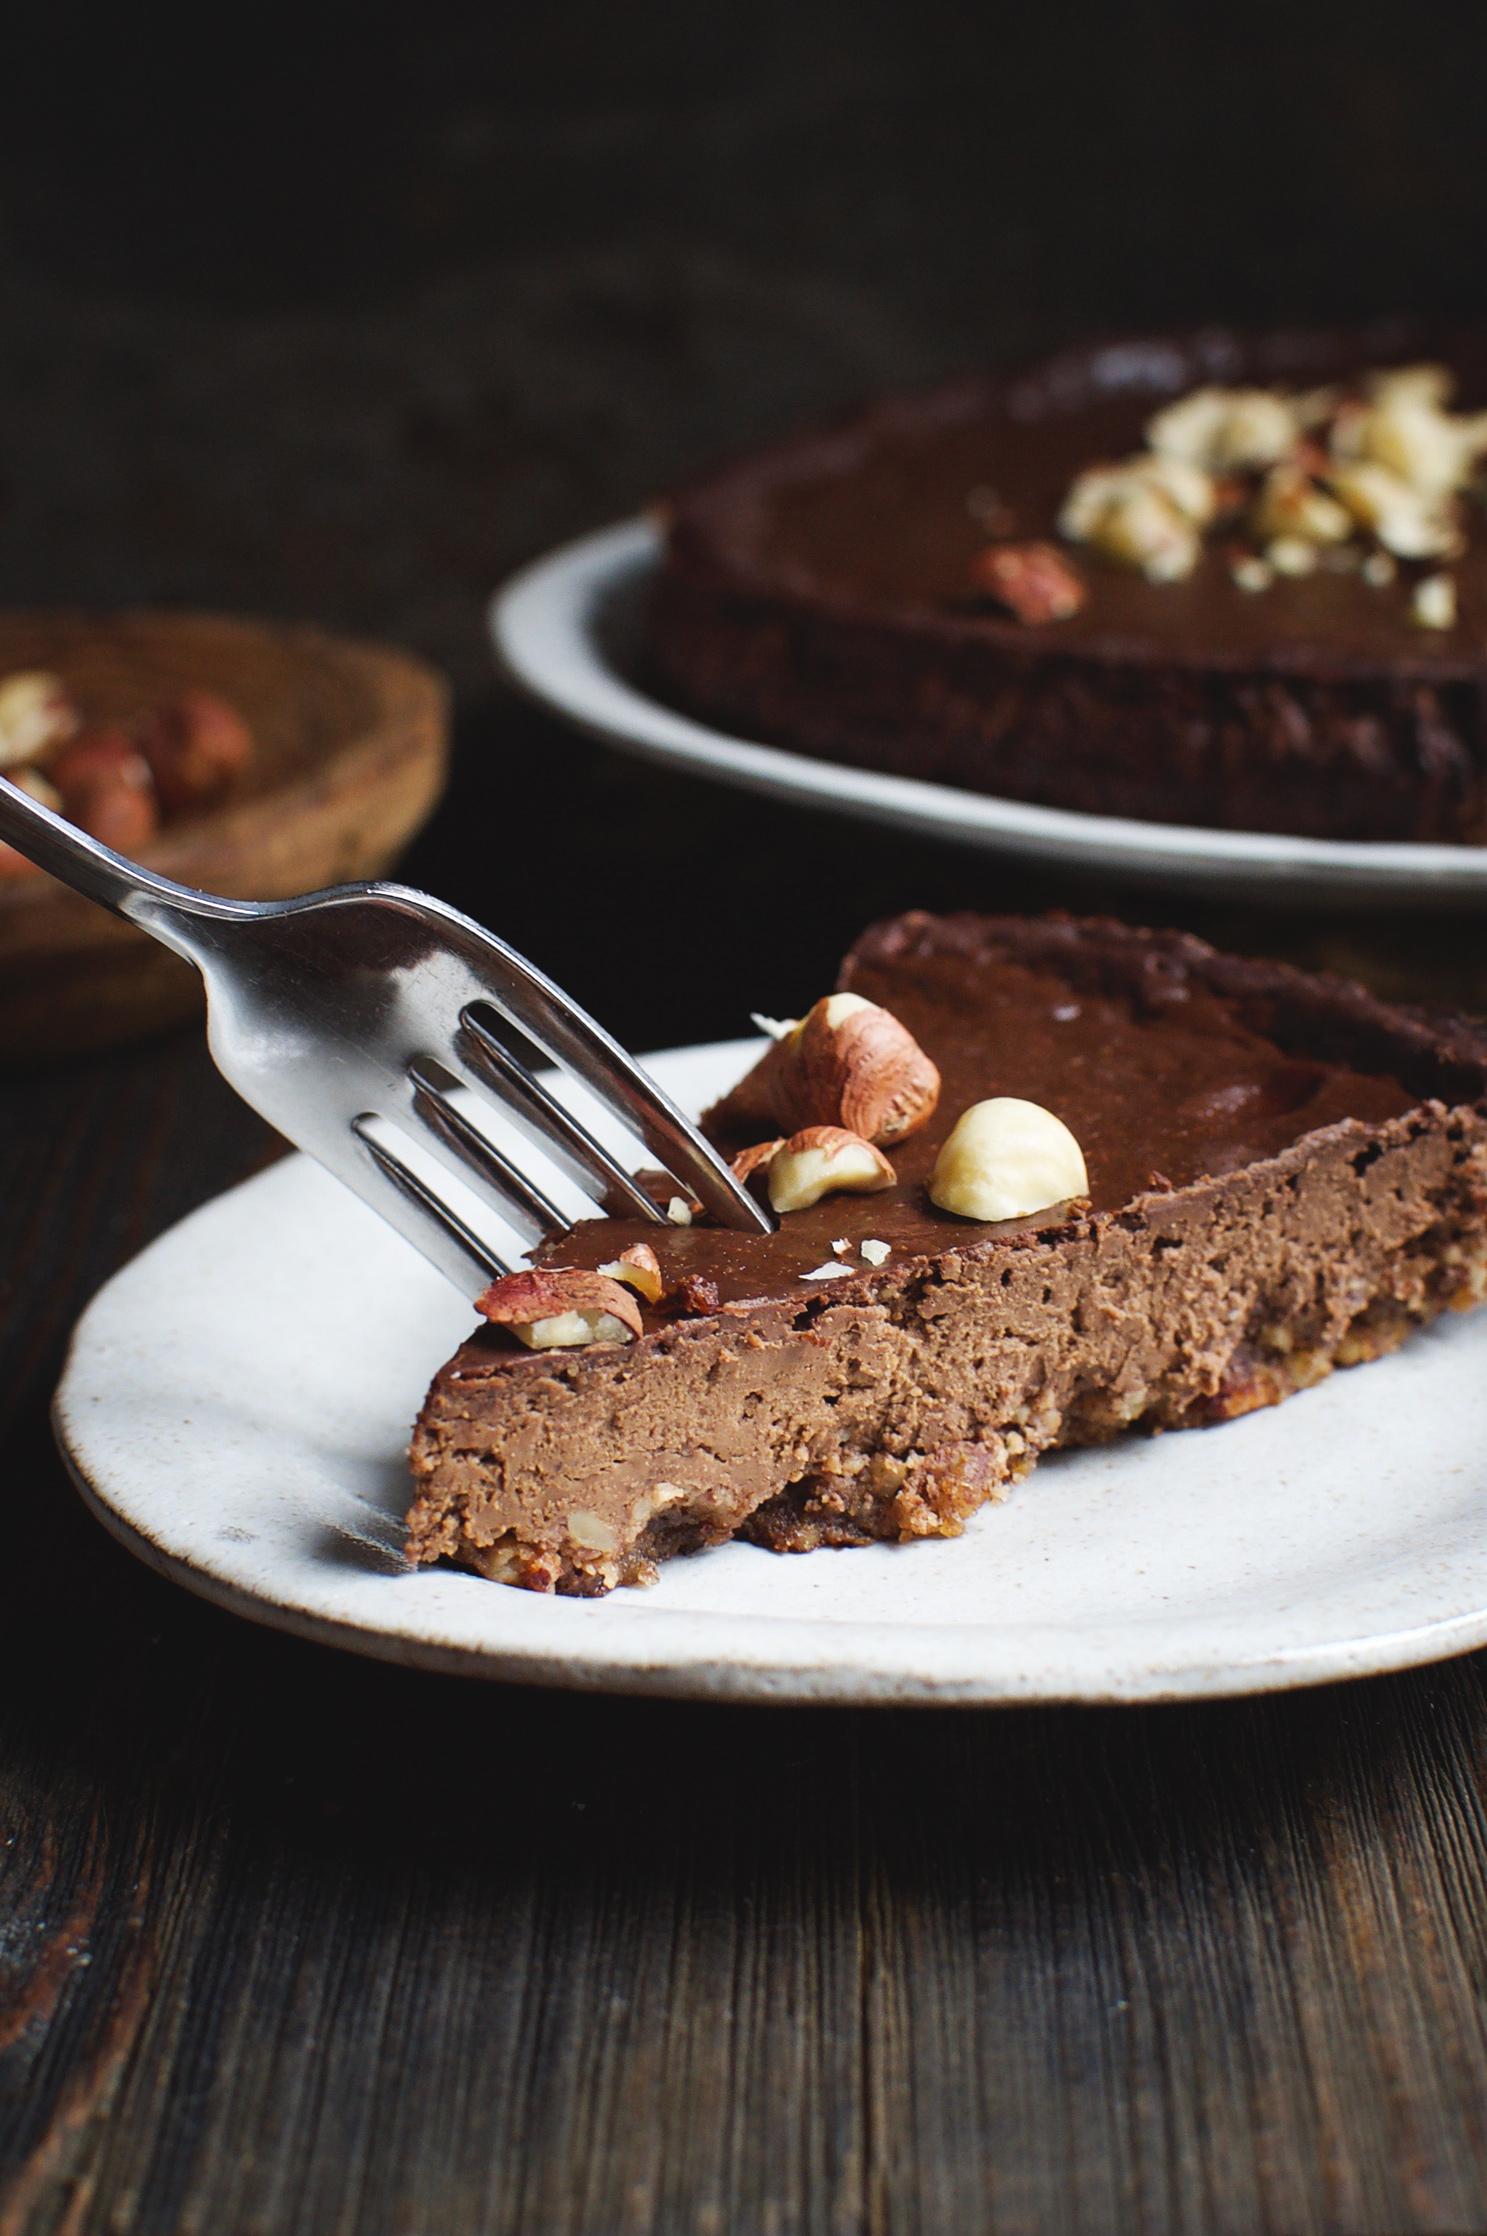 Low-Carb Chocolate Hazelnut Fudge Pie on a dessert plate.